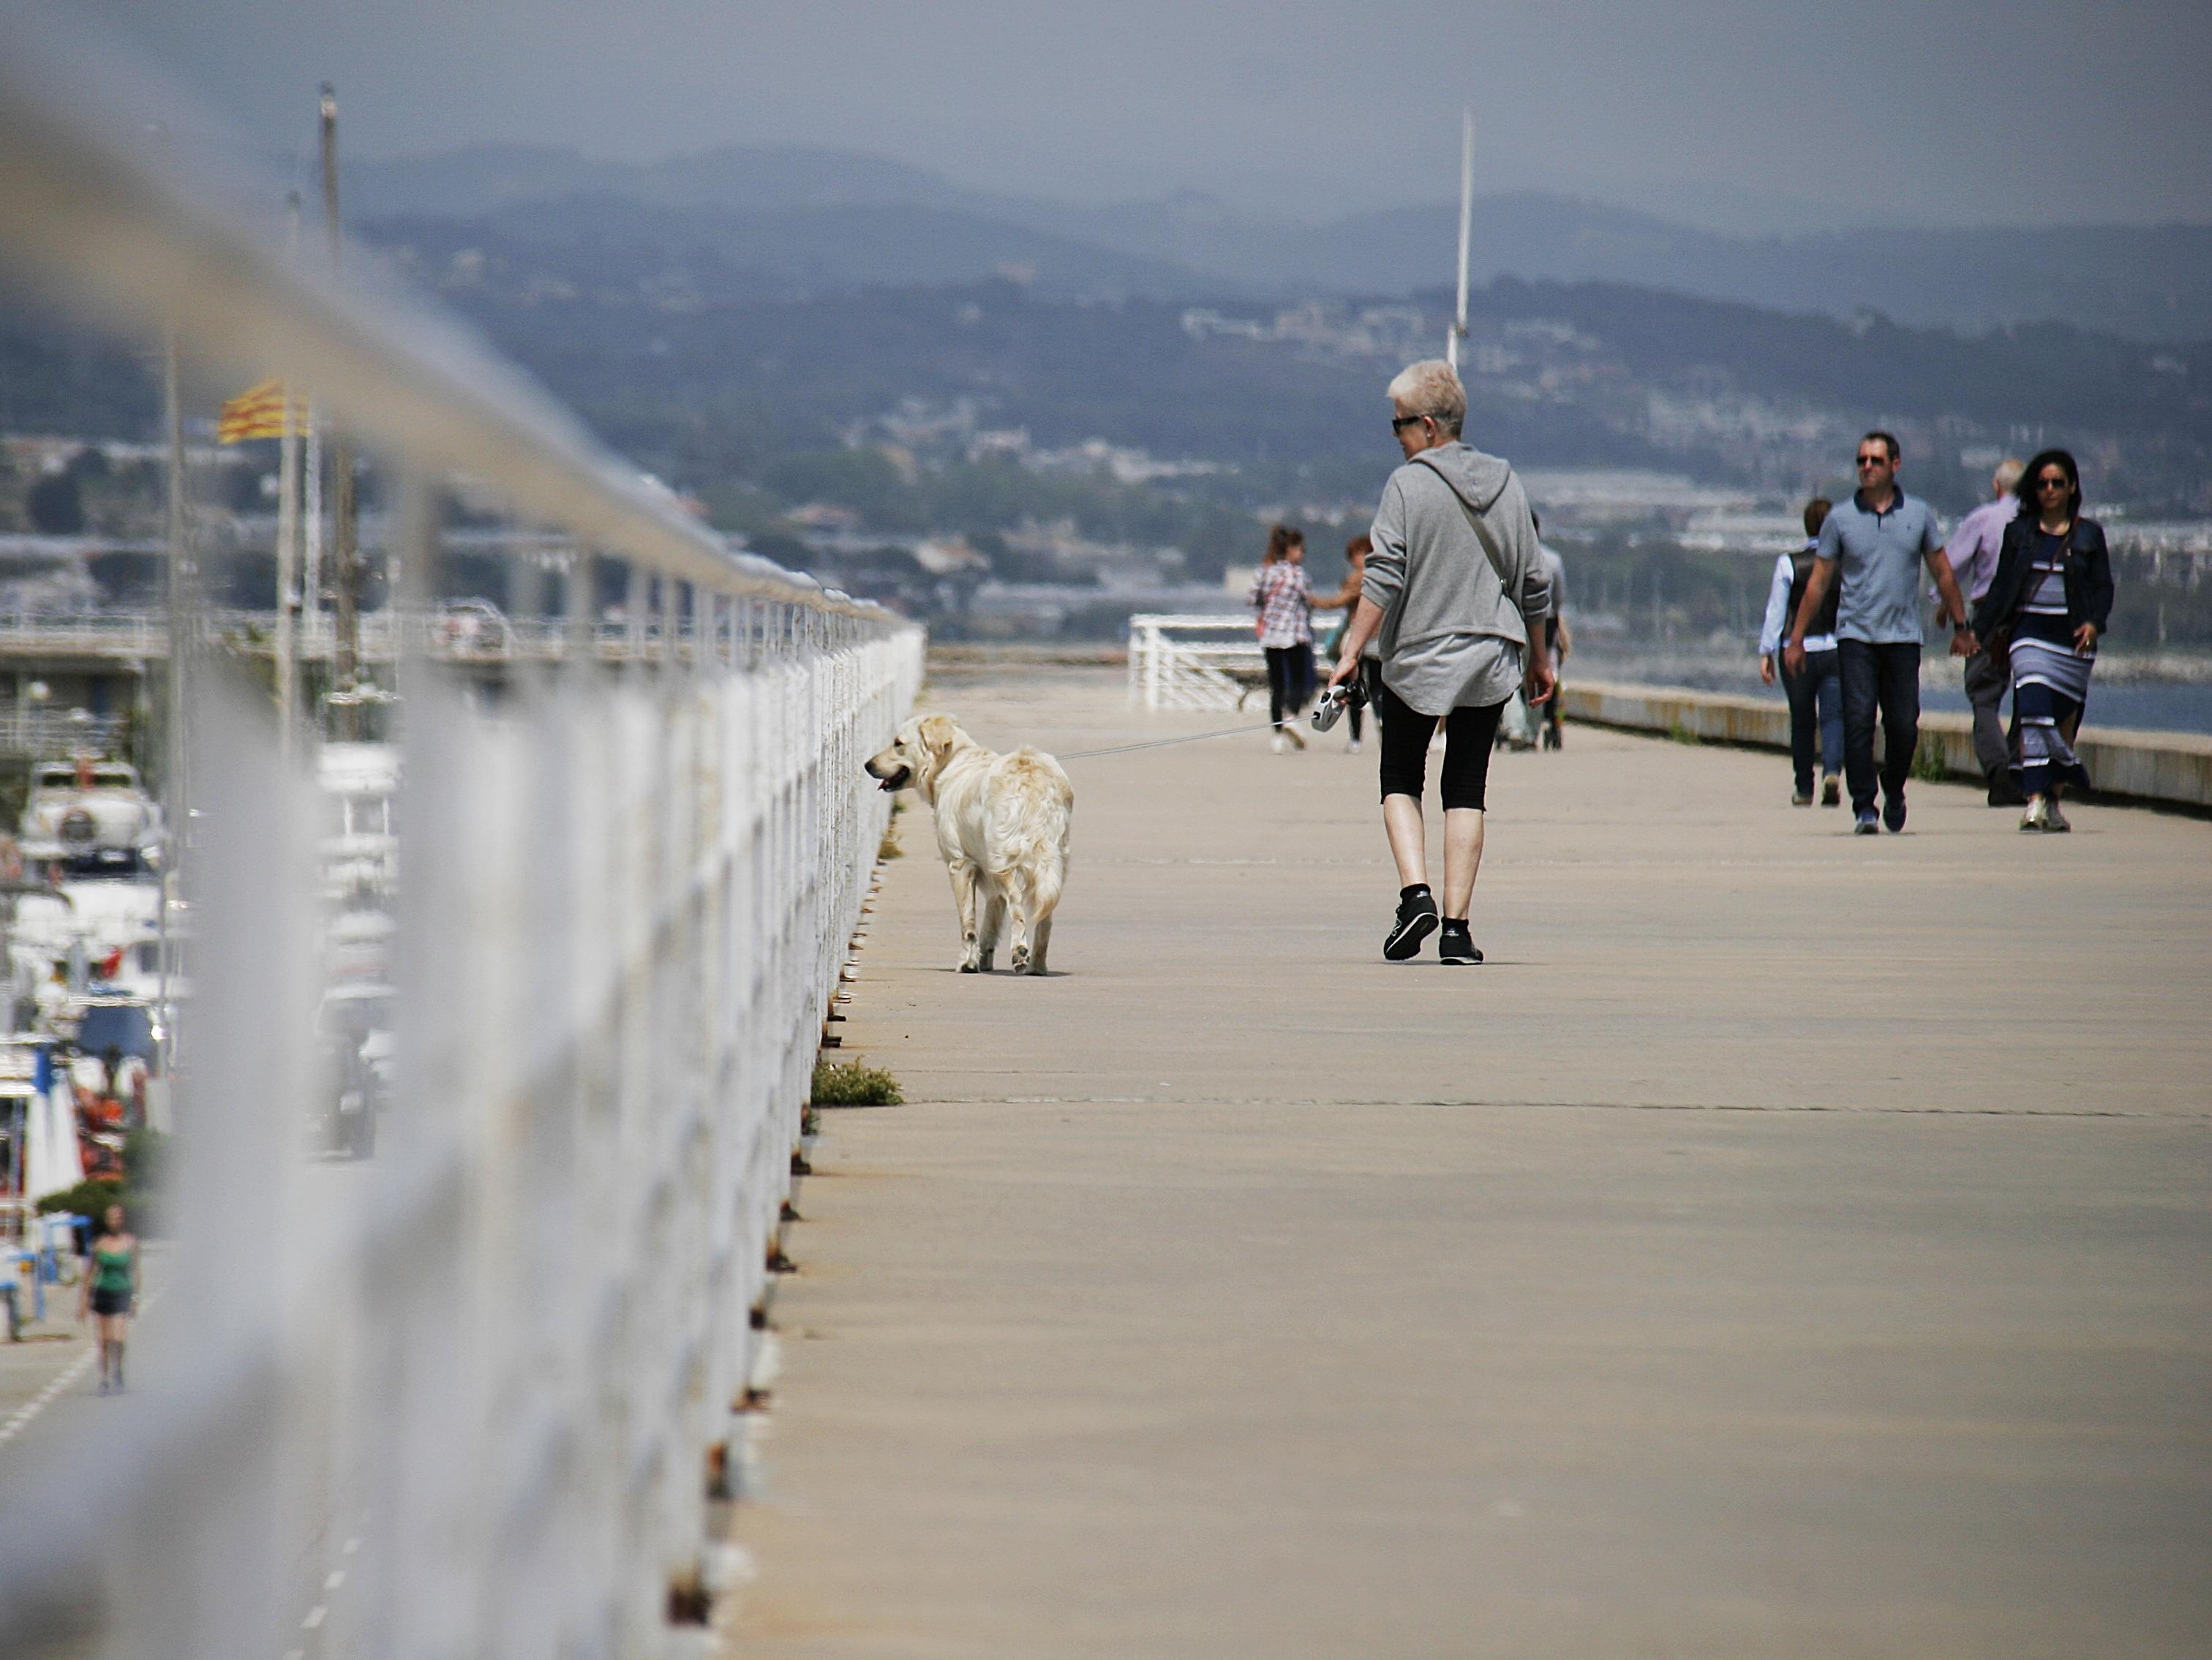 Gambar laut musim dingin Boardwalk anjing hewan gang #5: sea winter boardwalk dog animal walkway walk pet vehicle tourism race people walking